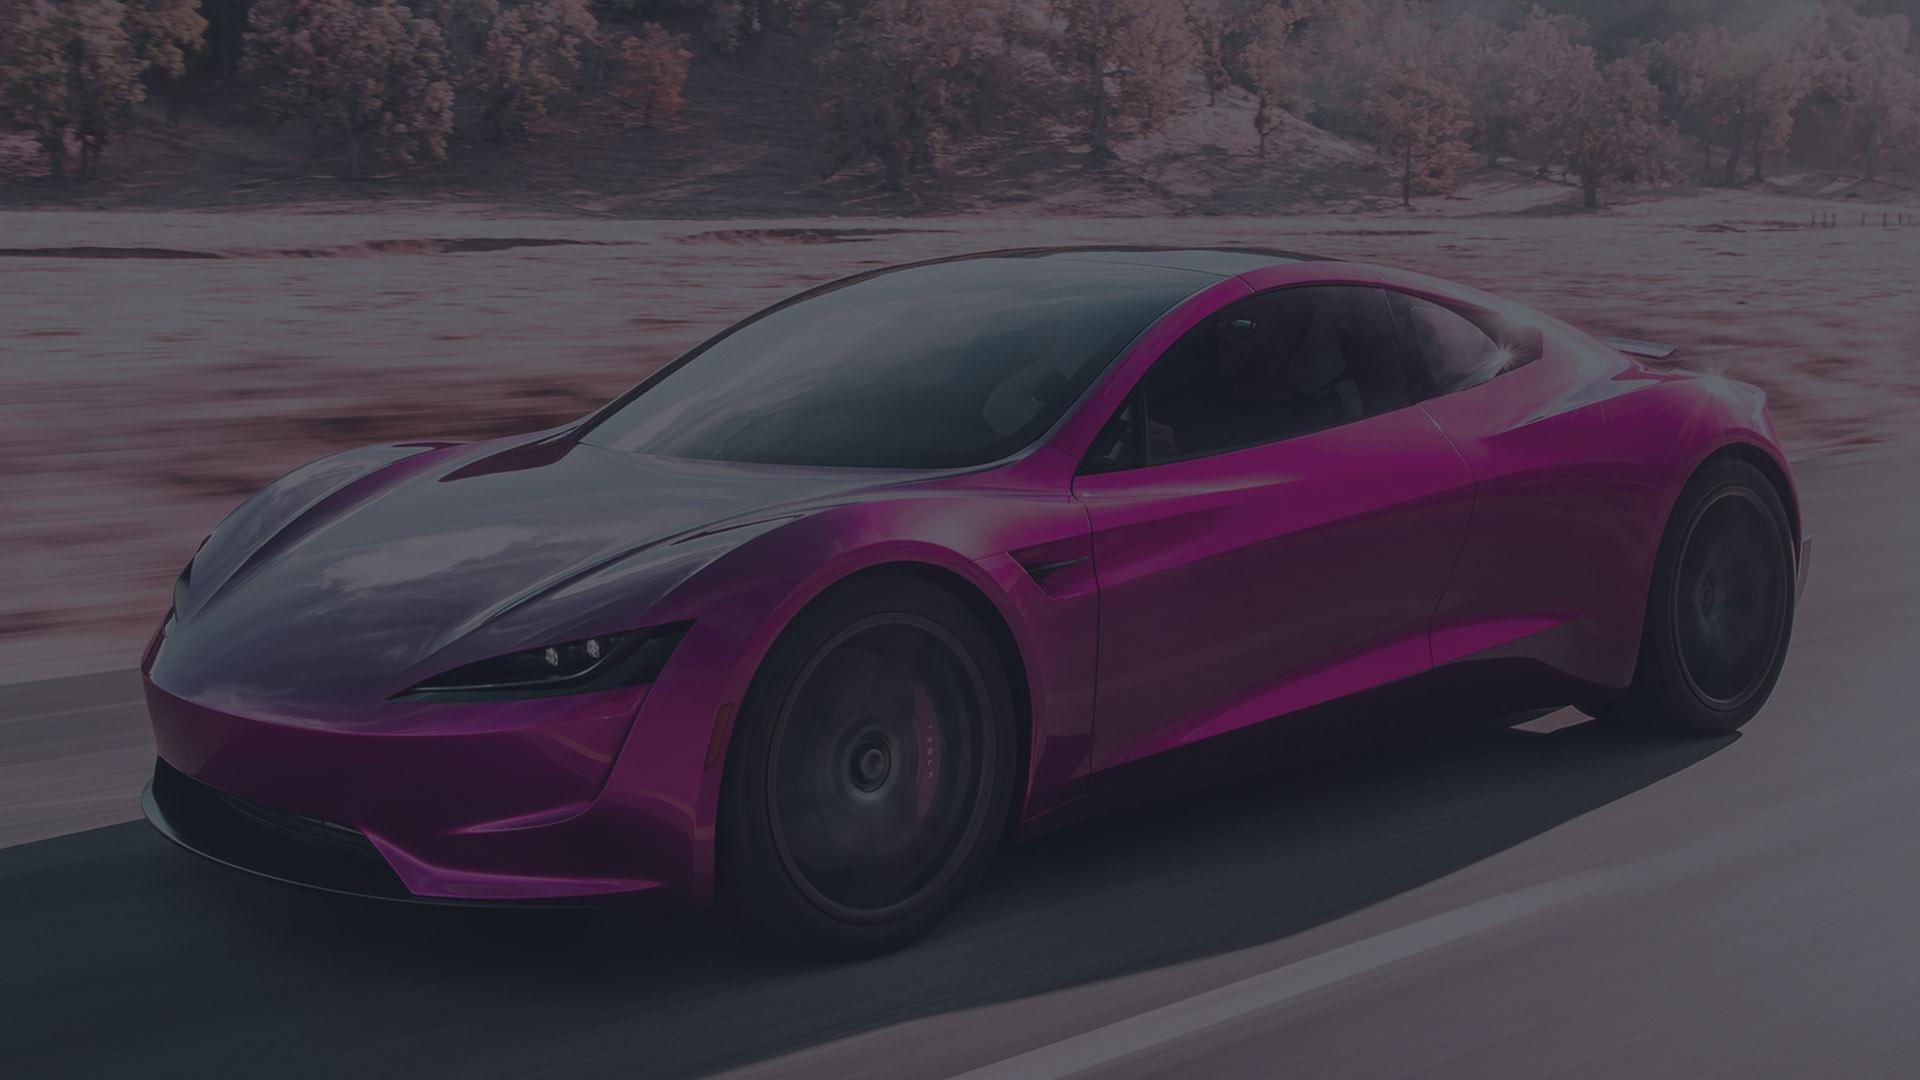 voiture sport rose